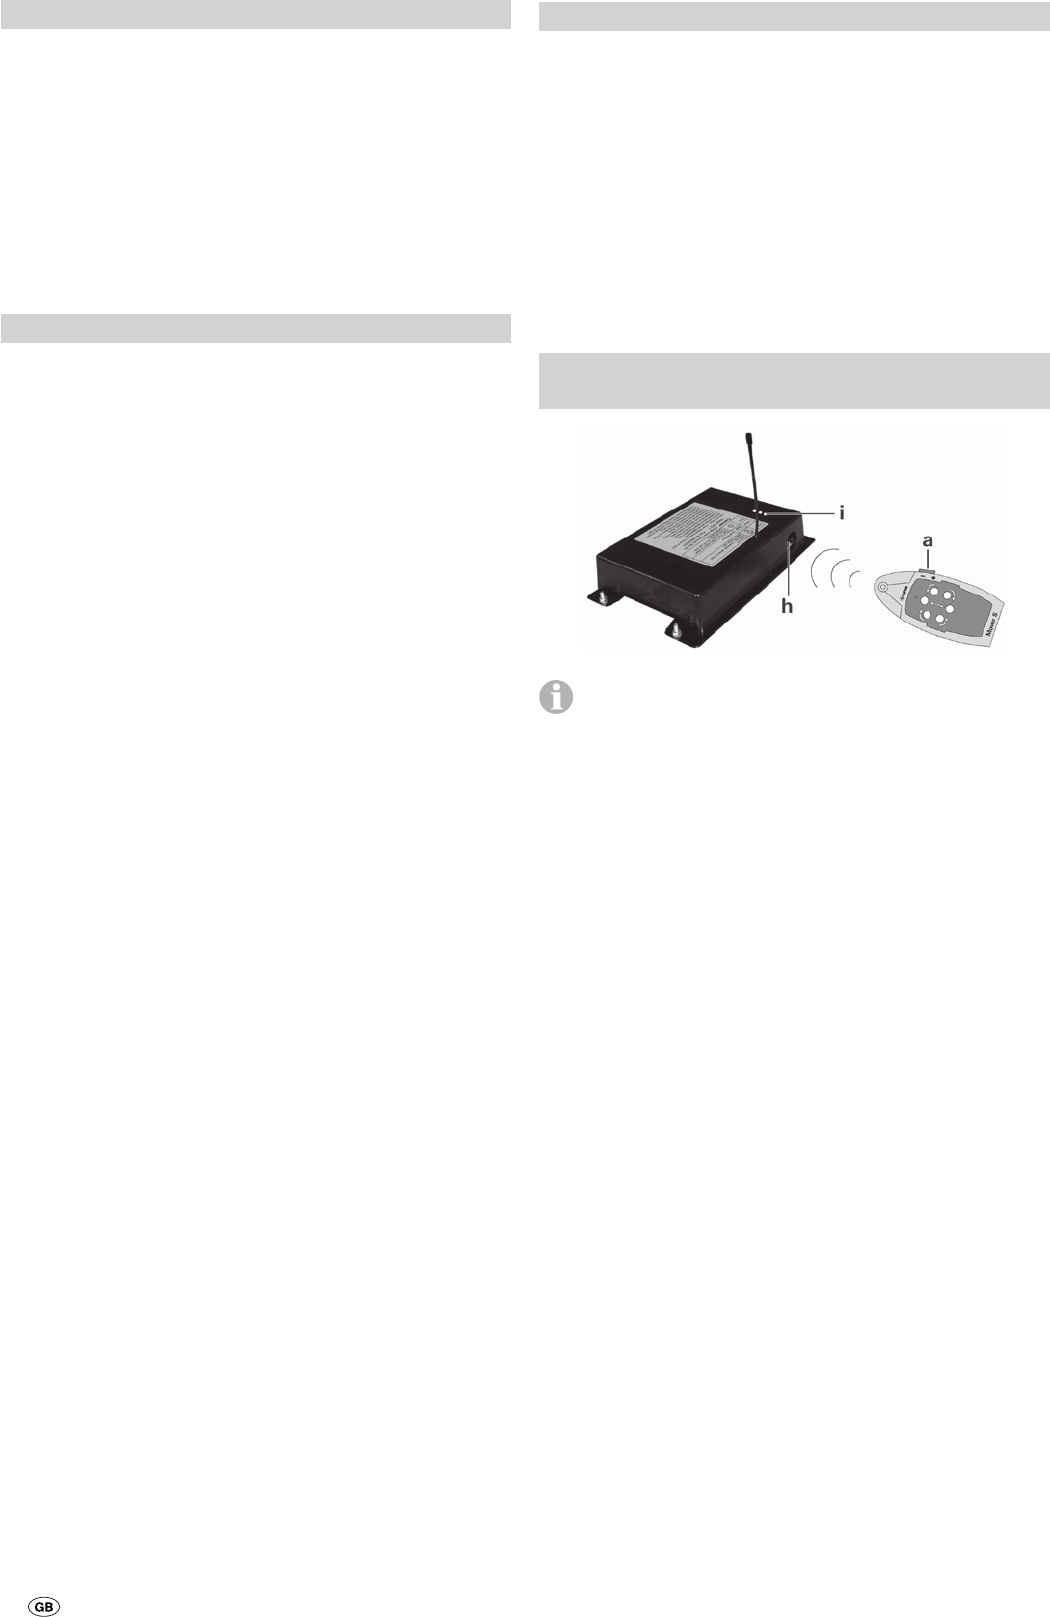 Handleiding truma mover mover s m1 pagina 14 van 68 dansk handleiding truma mover mover s m1 pagina 14 van 68 dansk deutsch english espanl franais italiano nederlands asfbconference2016 Choice Image